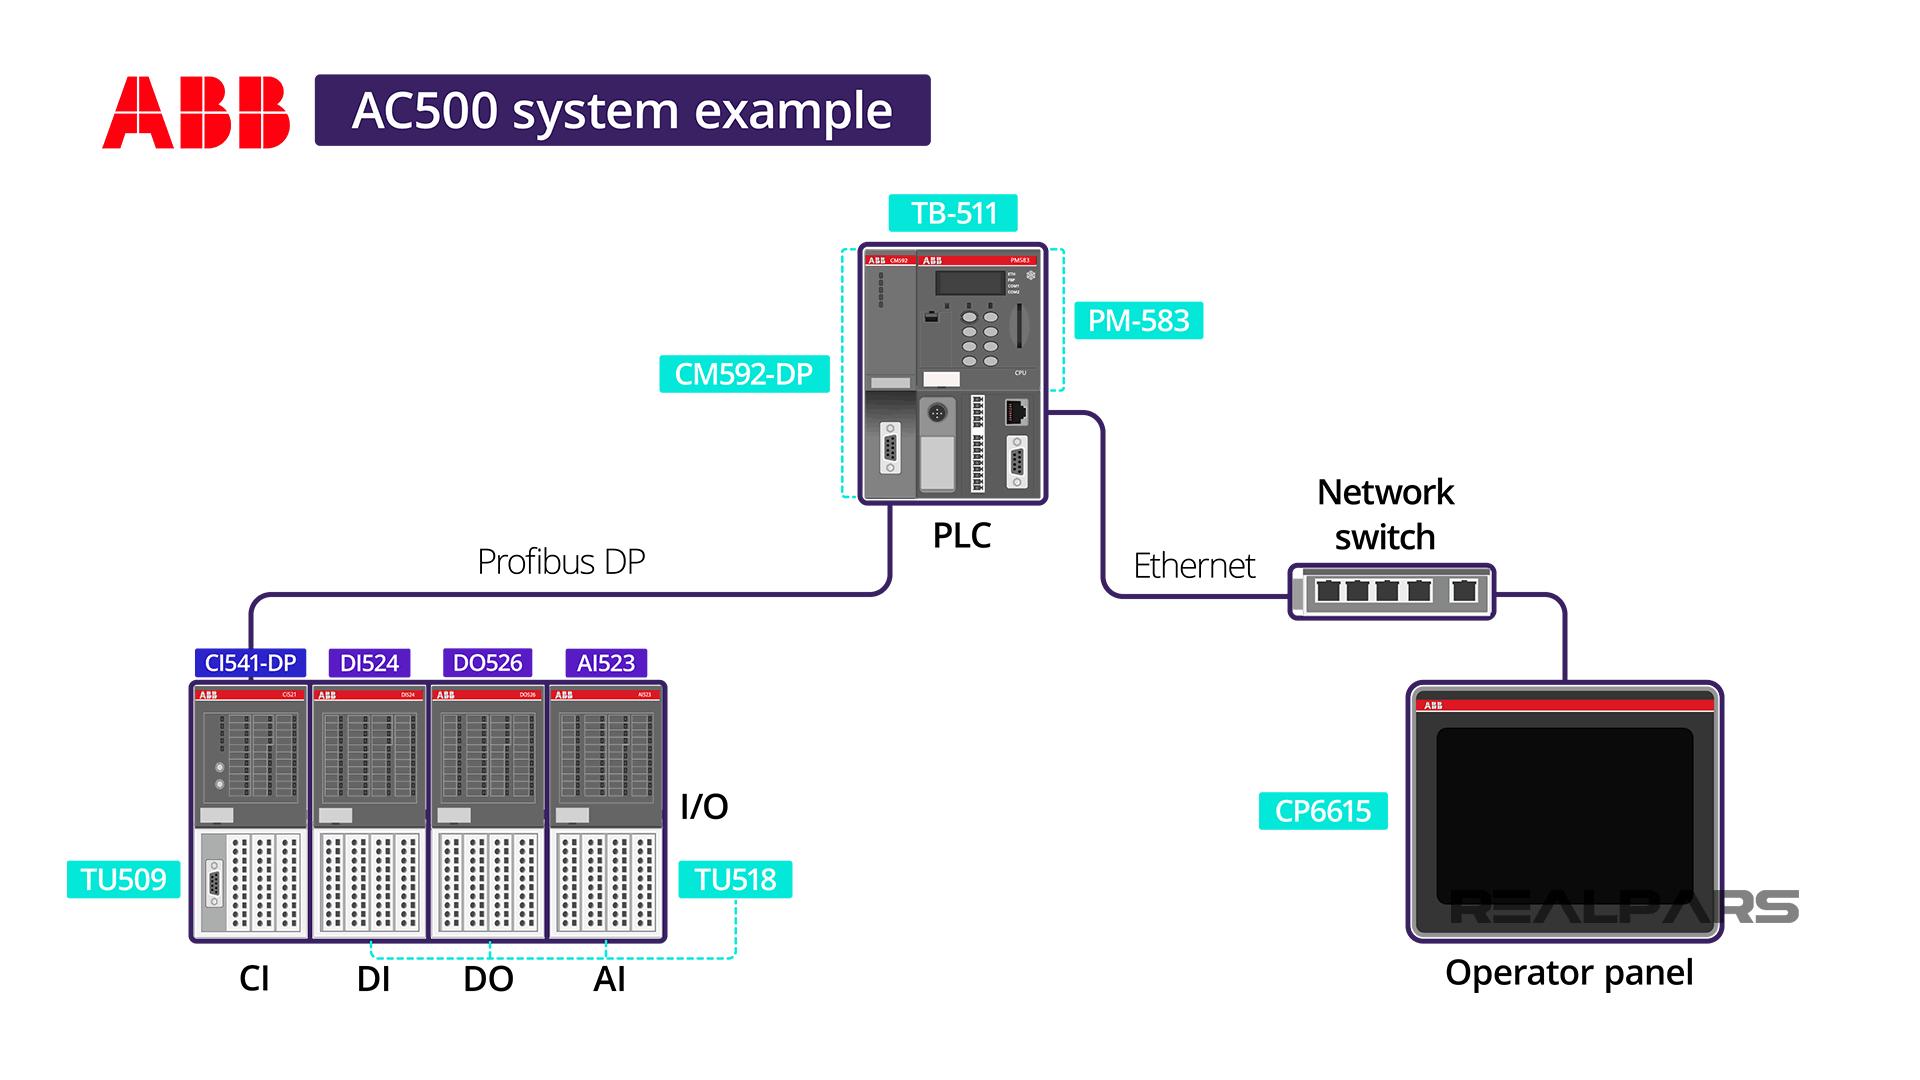 CP6615 Operator Control Panel